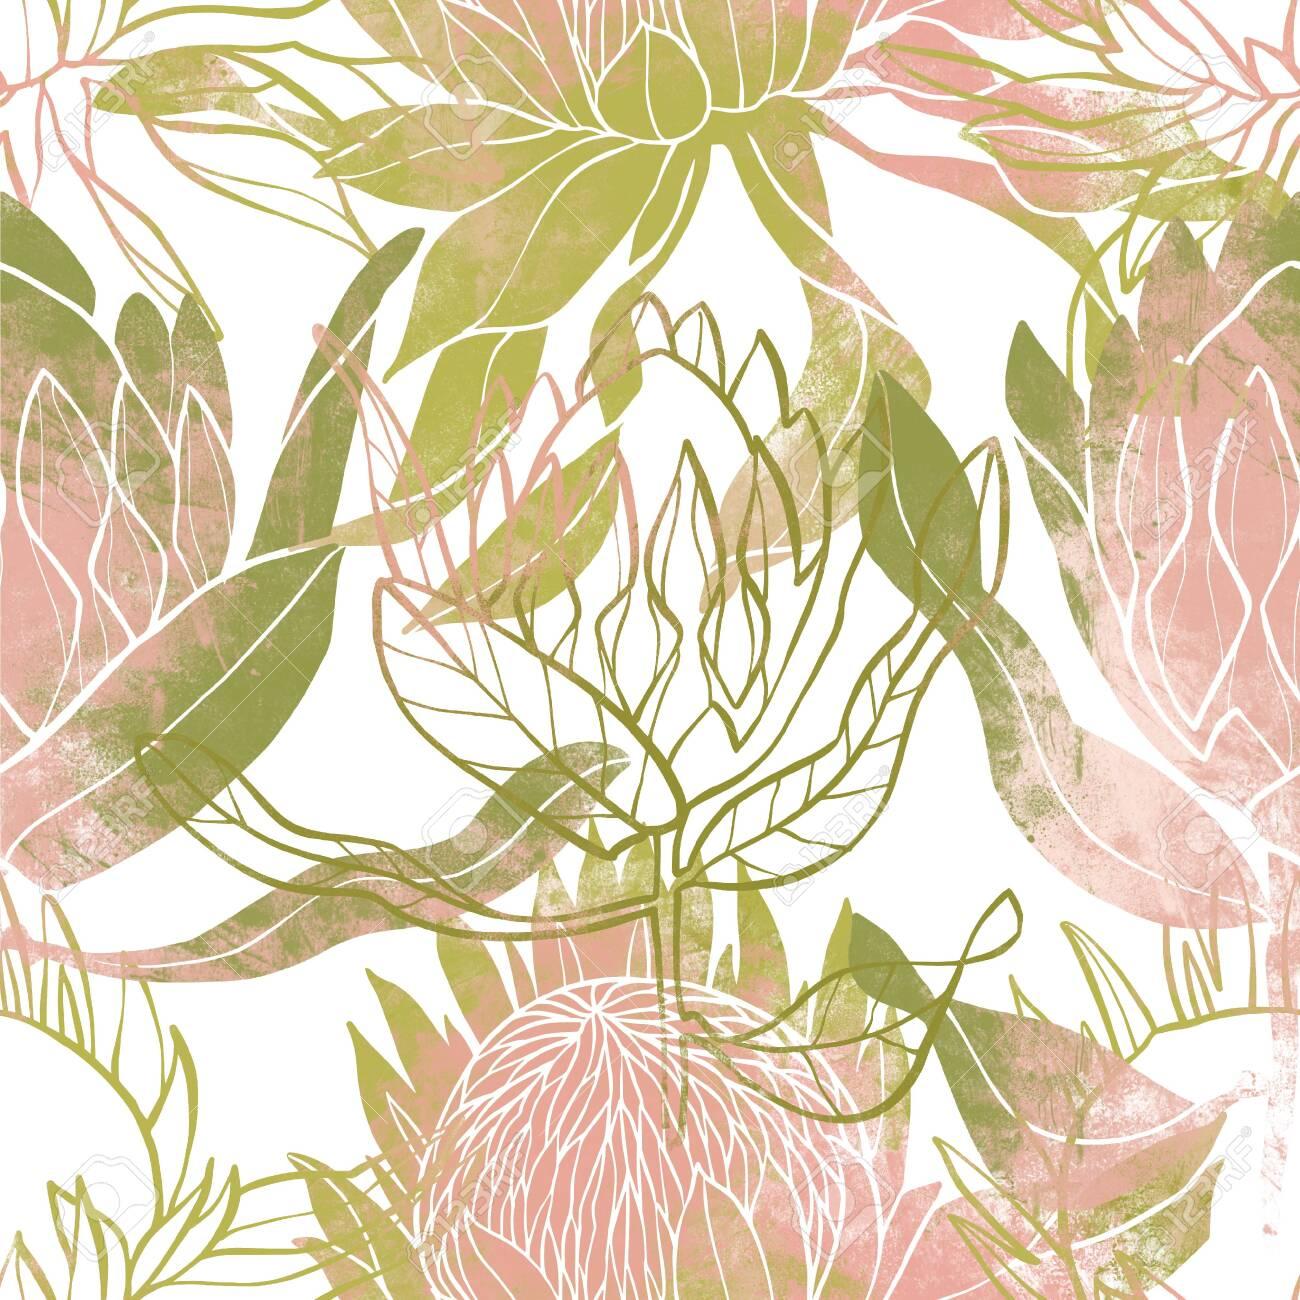 Pink and green flower pattern. Protea flower. Hand drawn illustration. Fullsize raster artwork. - 132391945